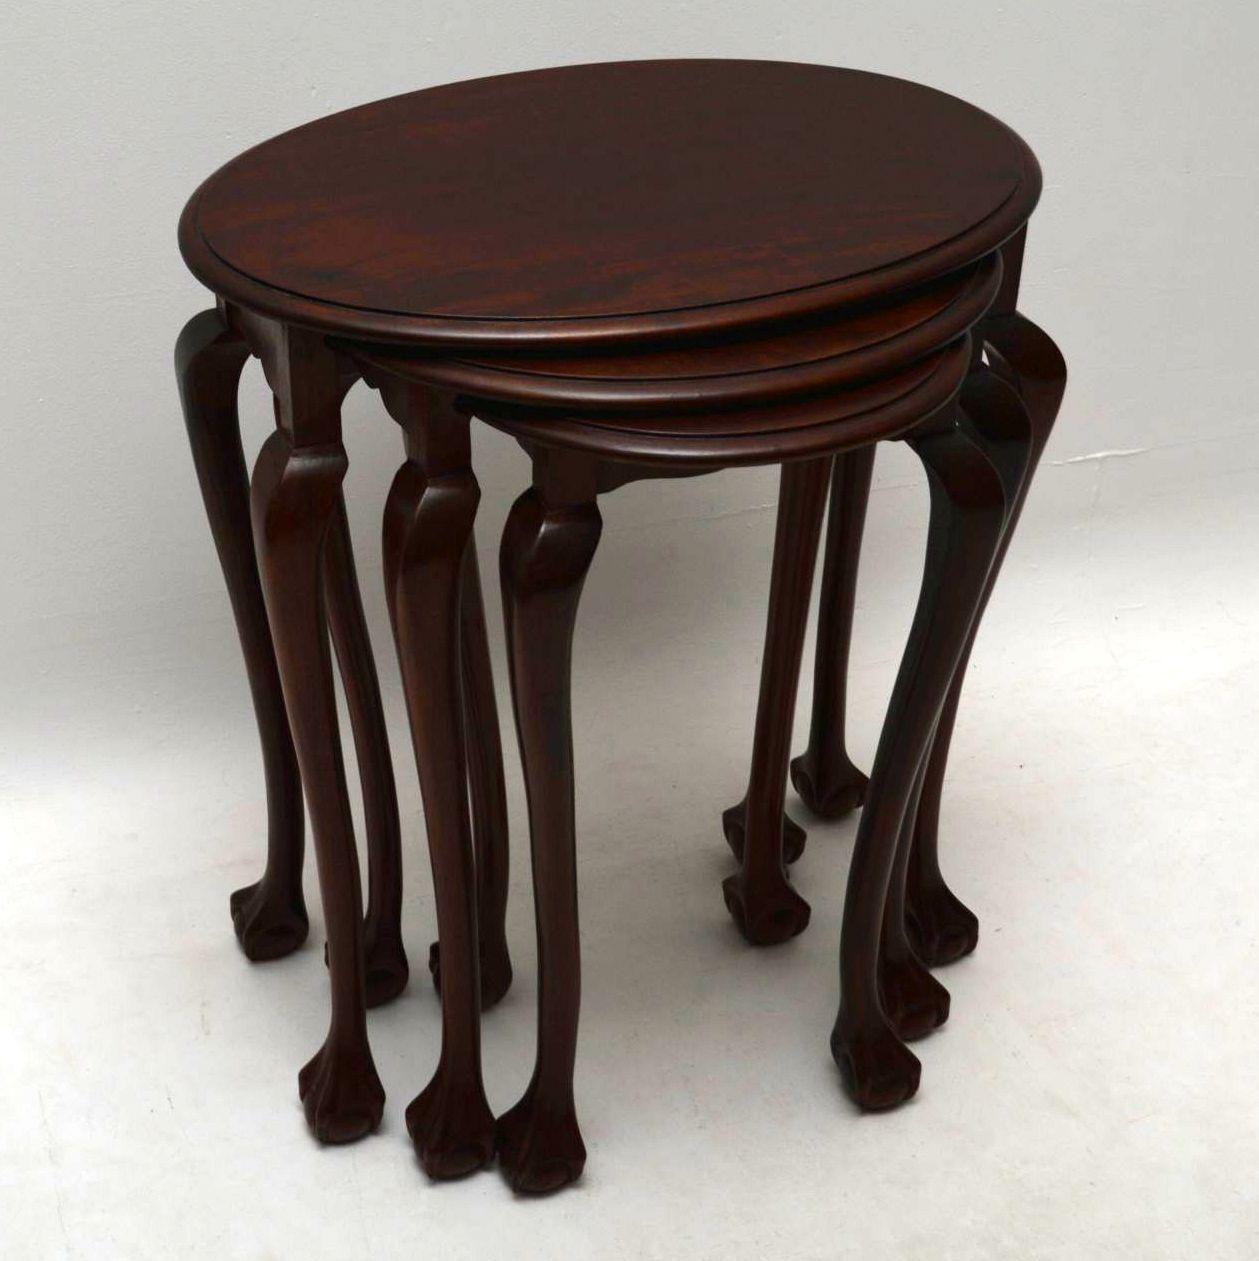 Antique Mahogany Nest of Tables